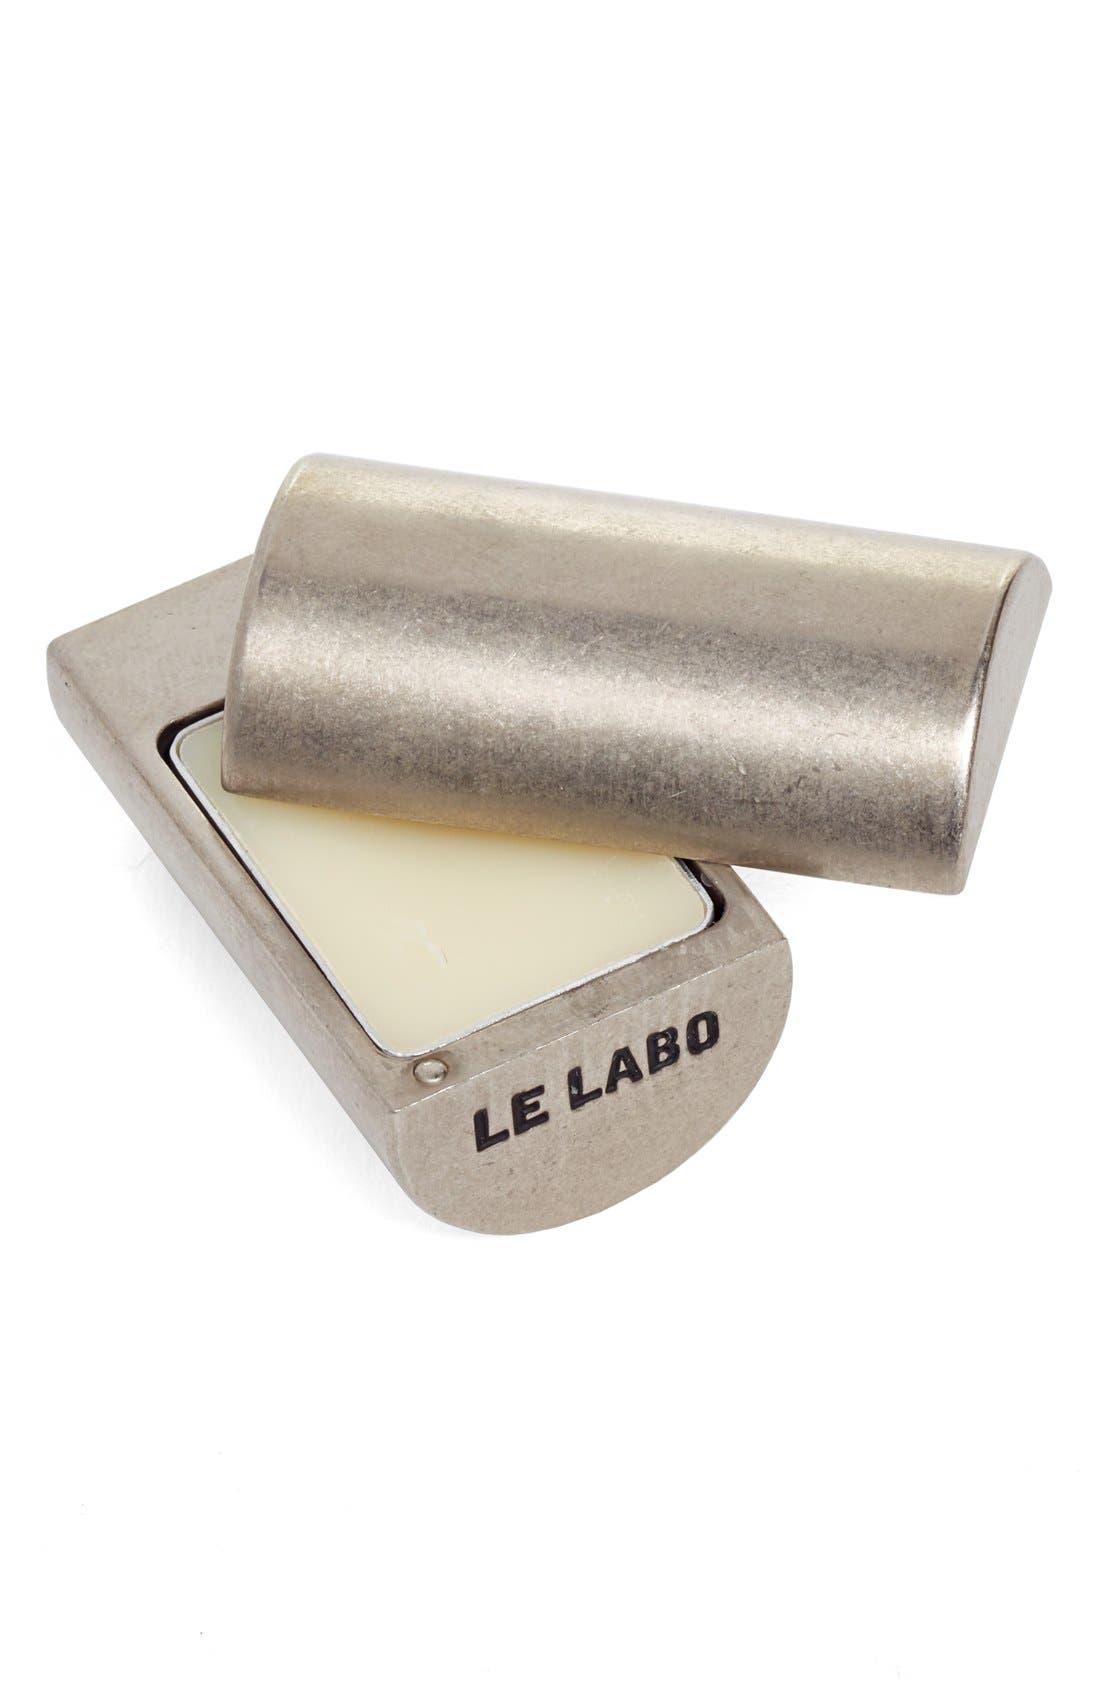 Le Labo 'Labdanum 18' Solid Perfume